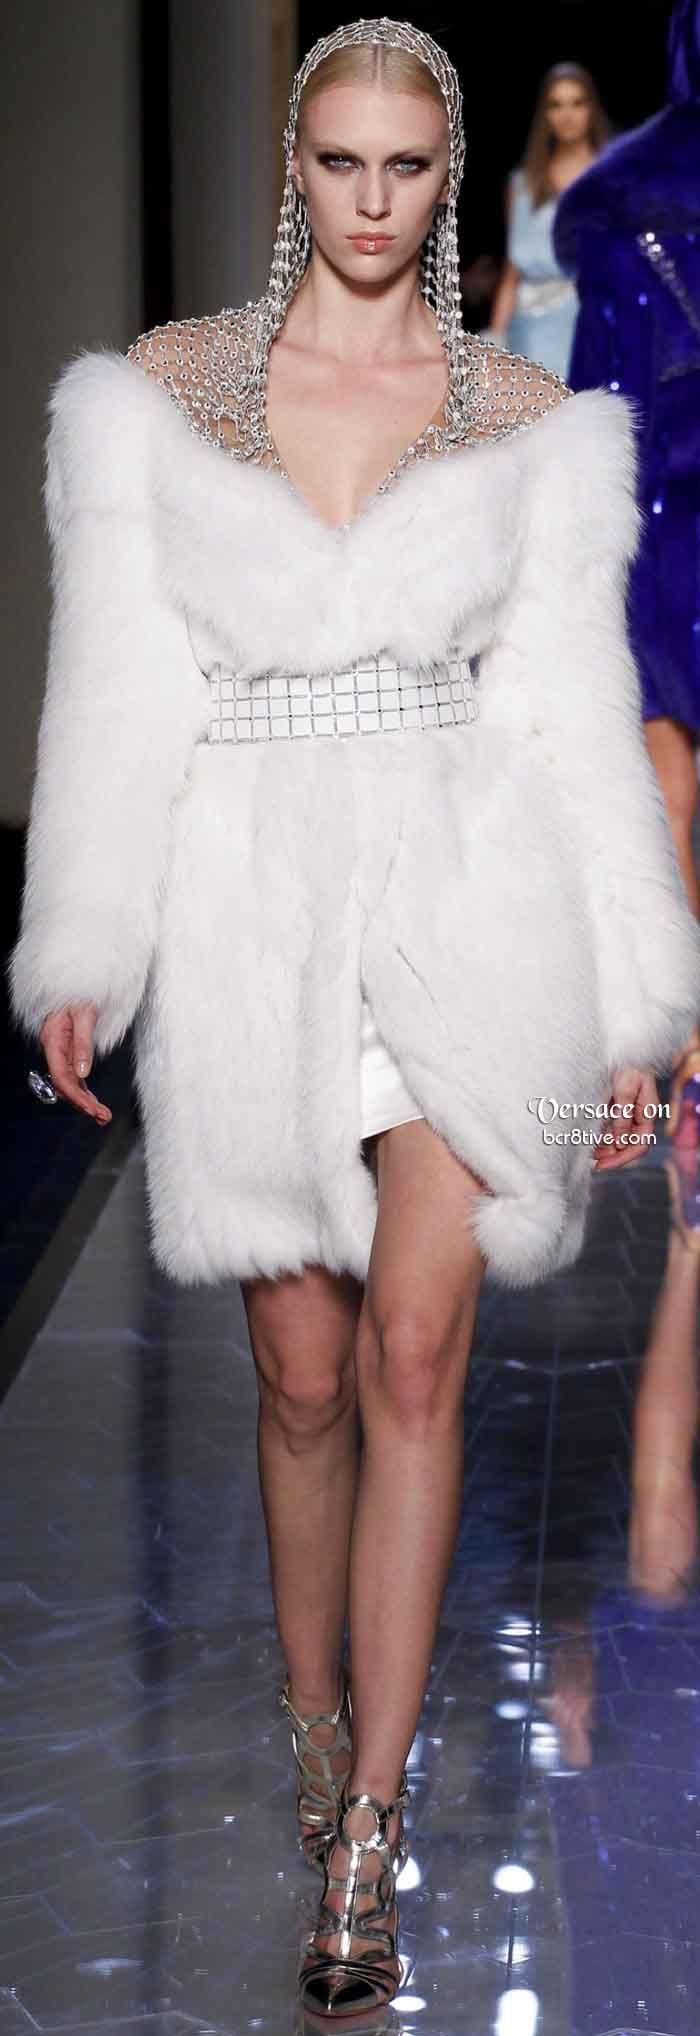 Beautiful Faux Fur Dress With Metal Mesh Headwear. Versace Spring 2014 Haute Couture